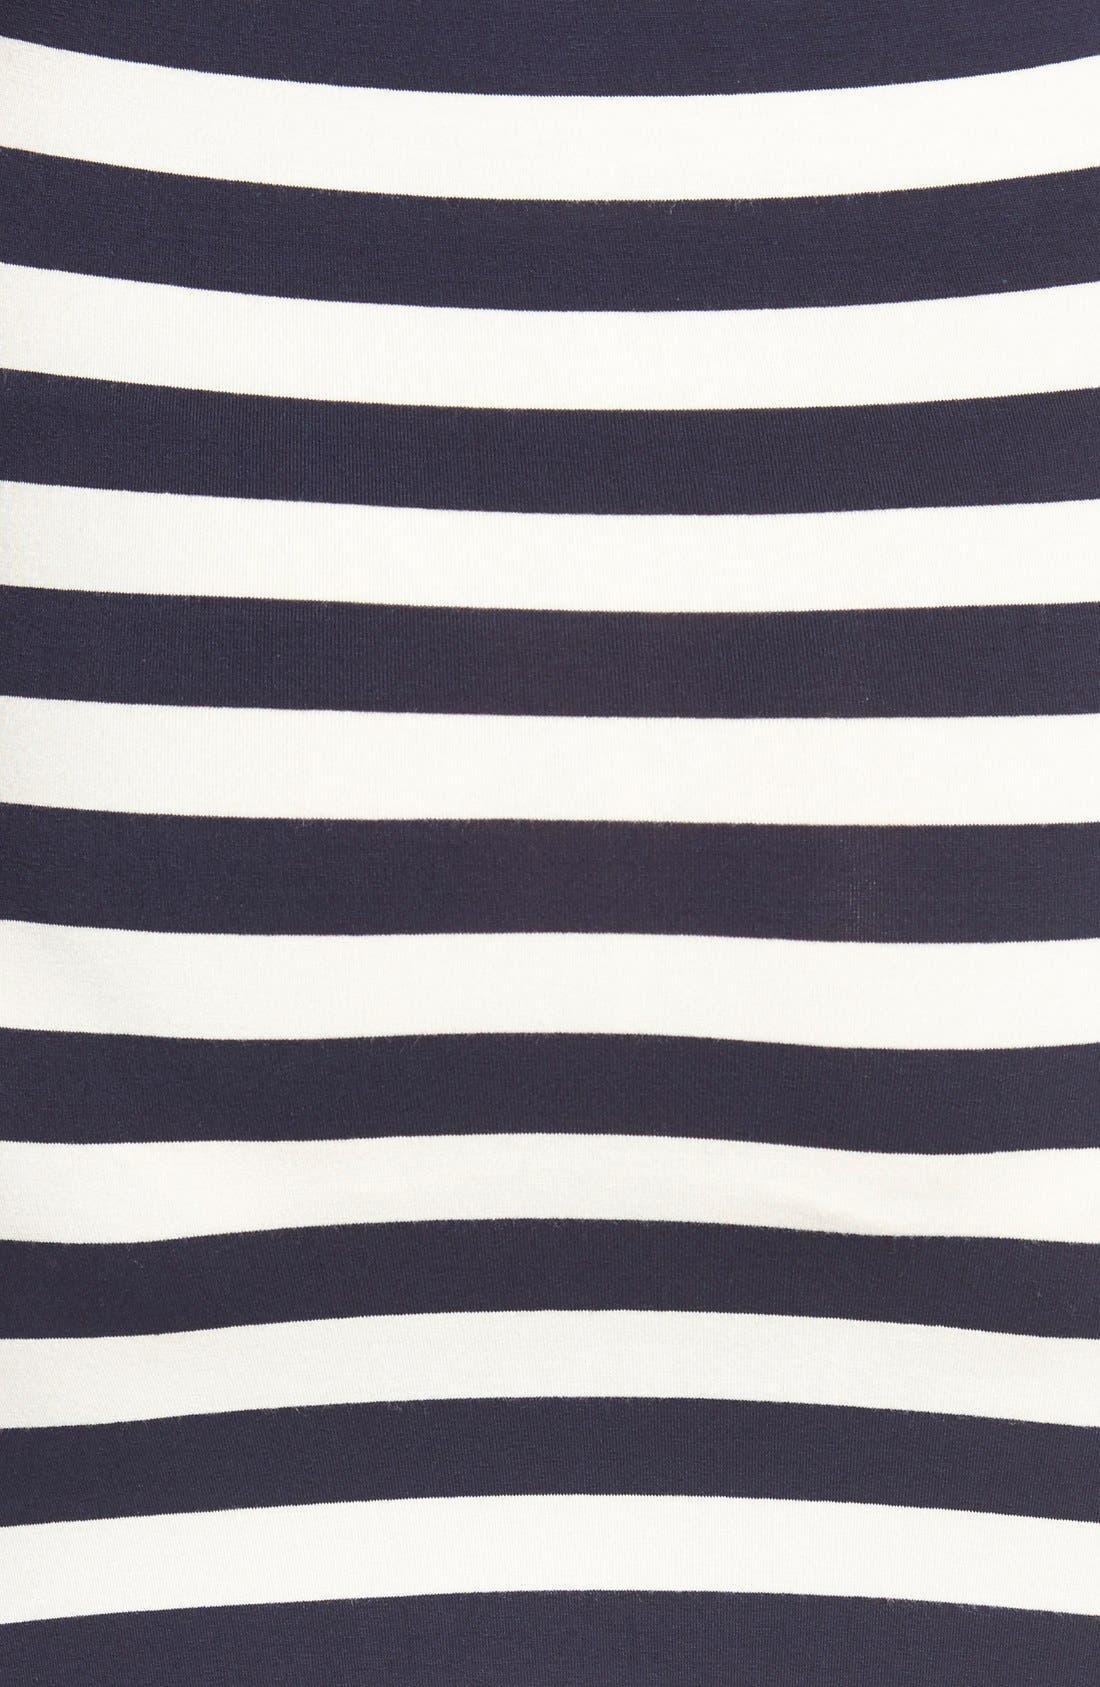 'Joy' Sleeveless Maternity/Nursing Midi Dress,                             Alternate thumbnail 5, color,                             Even Navy Stripe